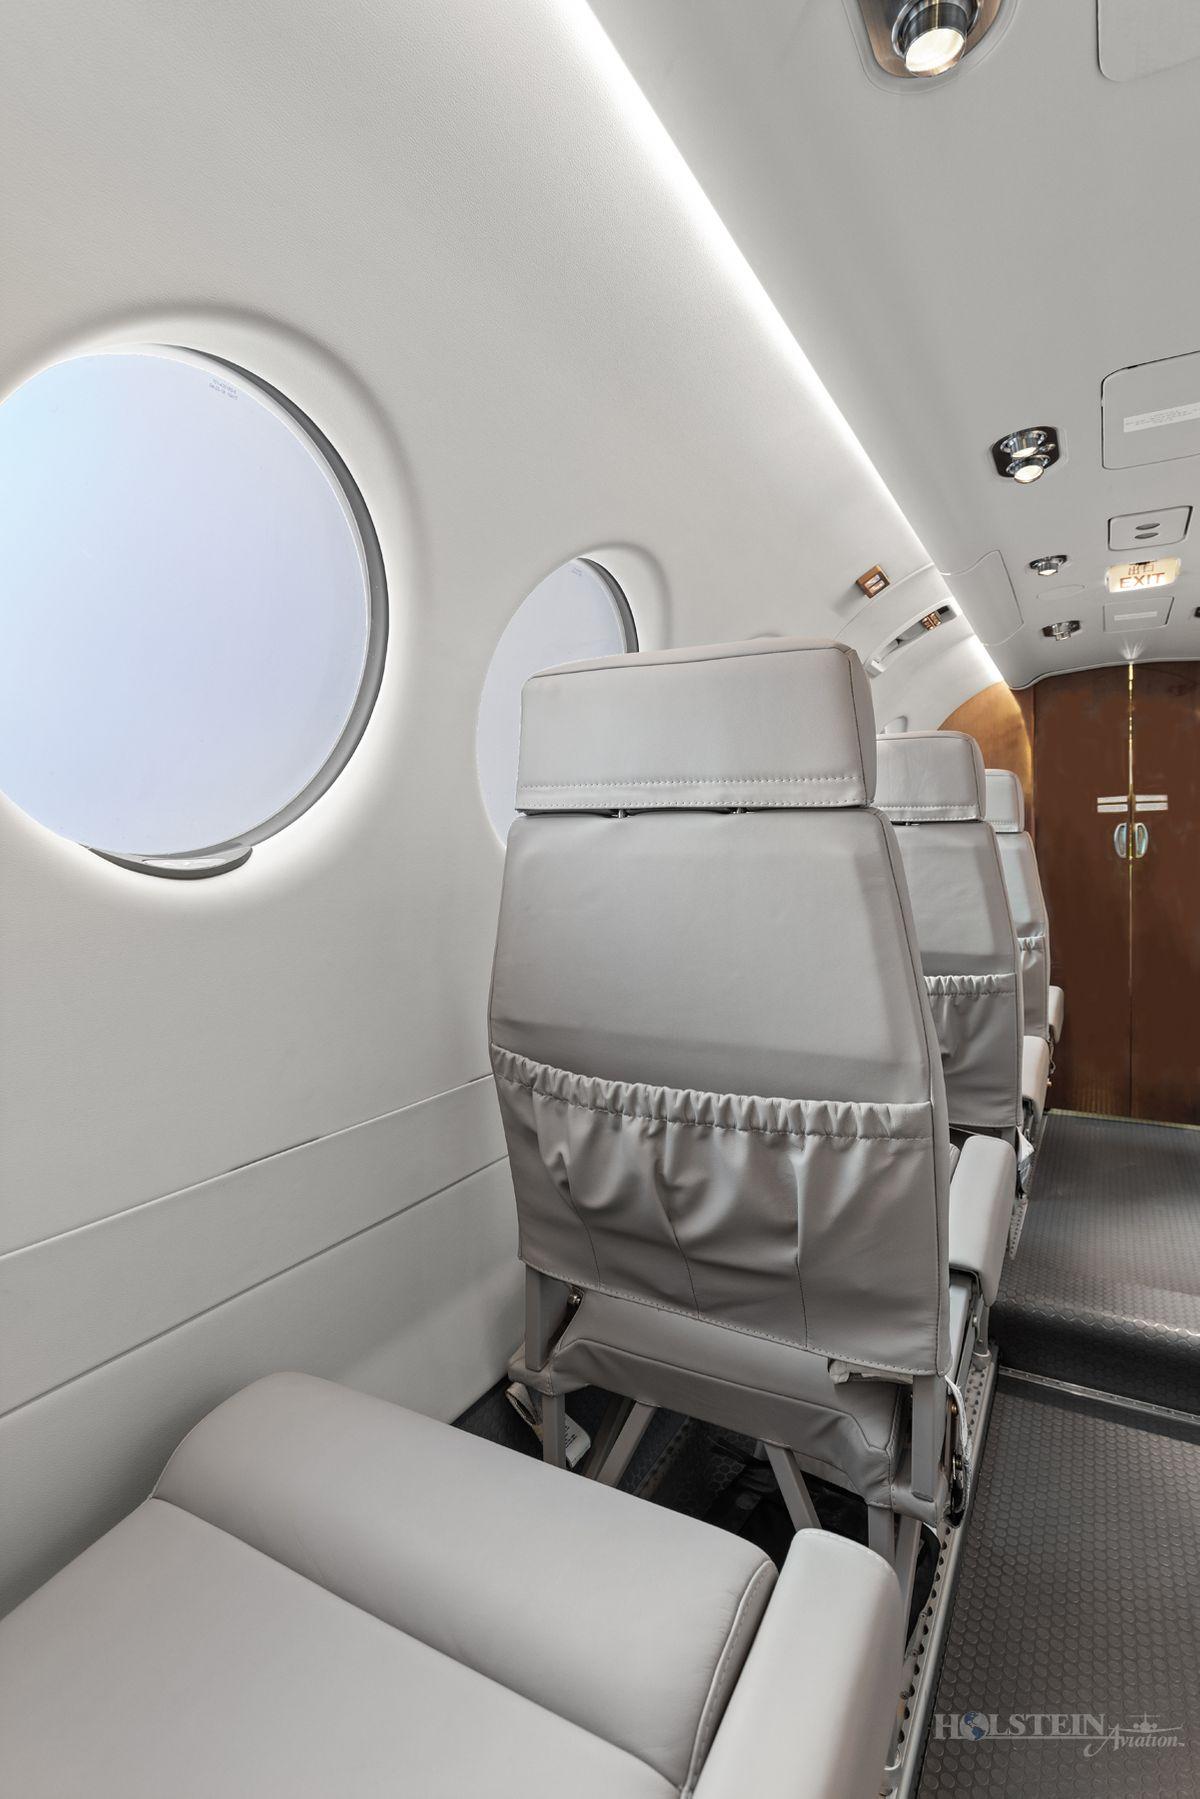 2018 King Air 350iER - FL-1157 - N1157F - Int - Seat Fold Down 3 RGB.jpg